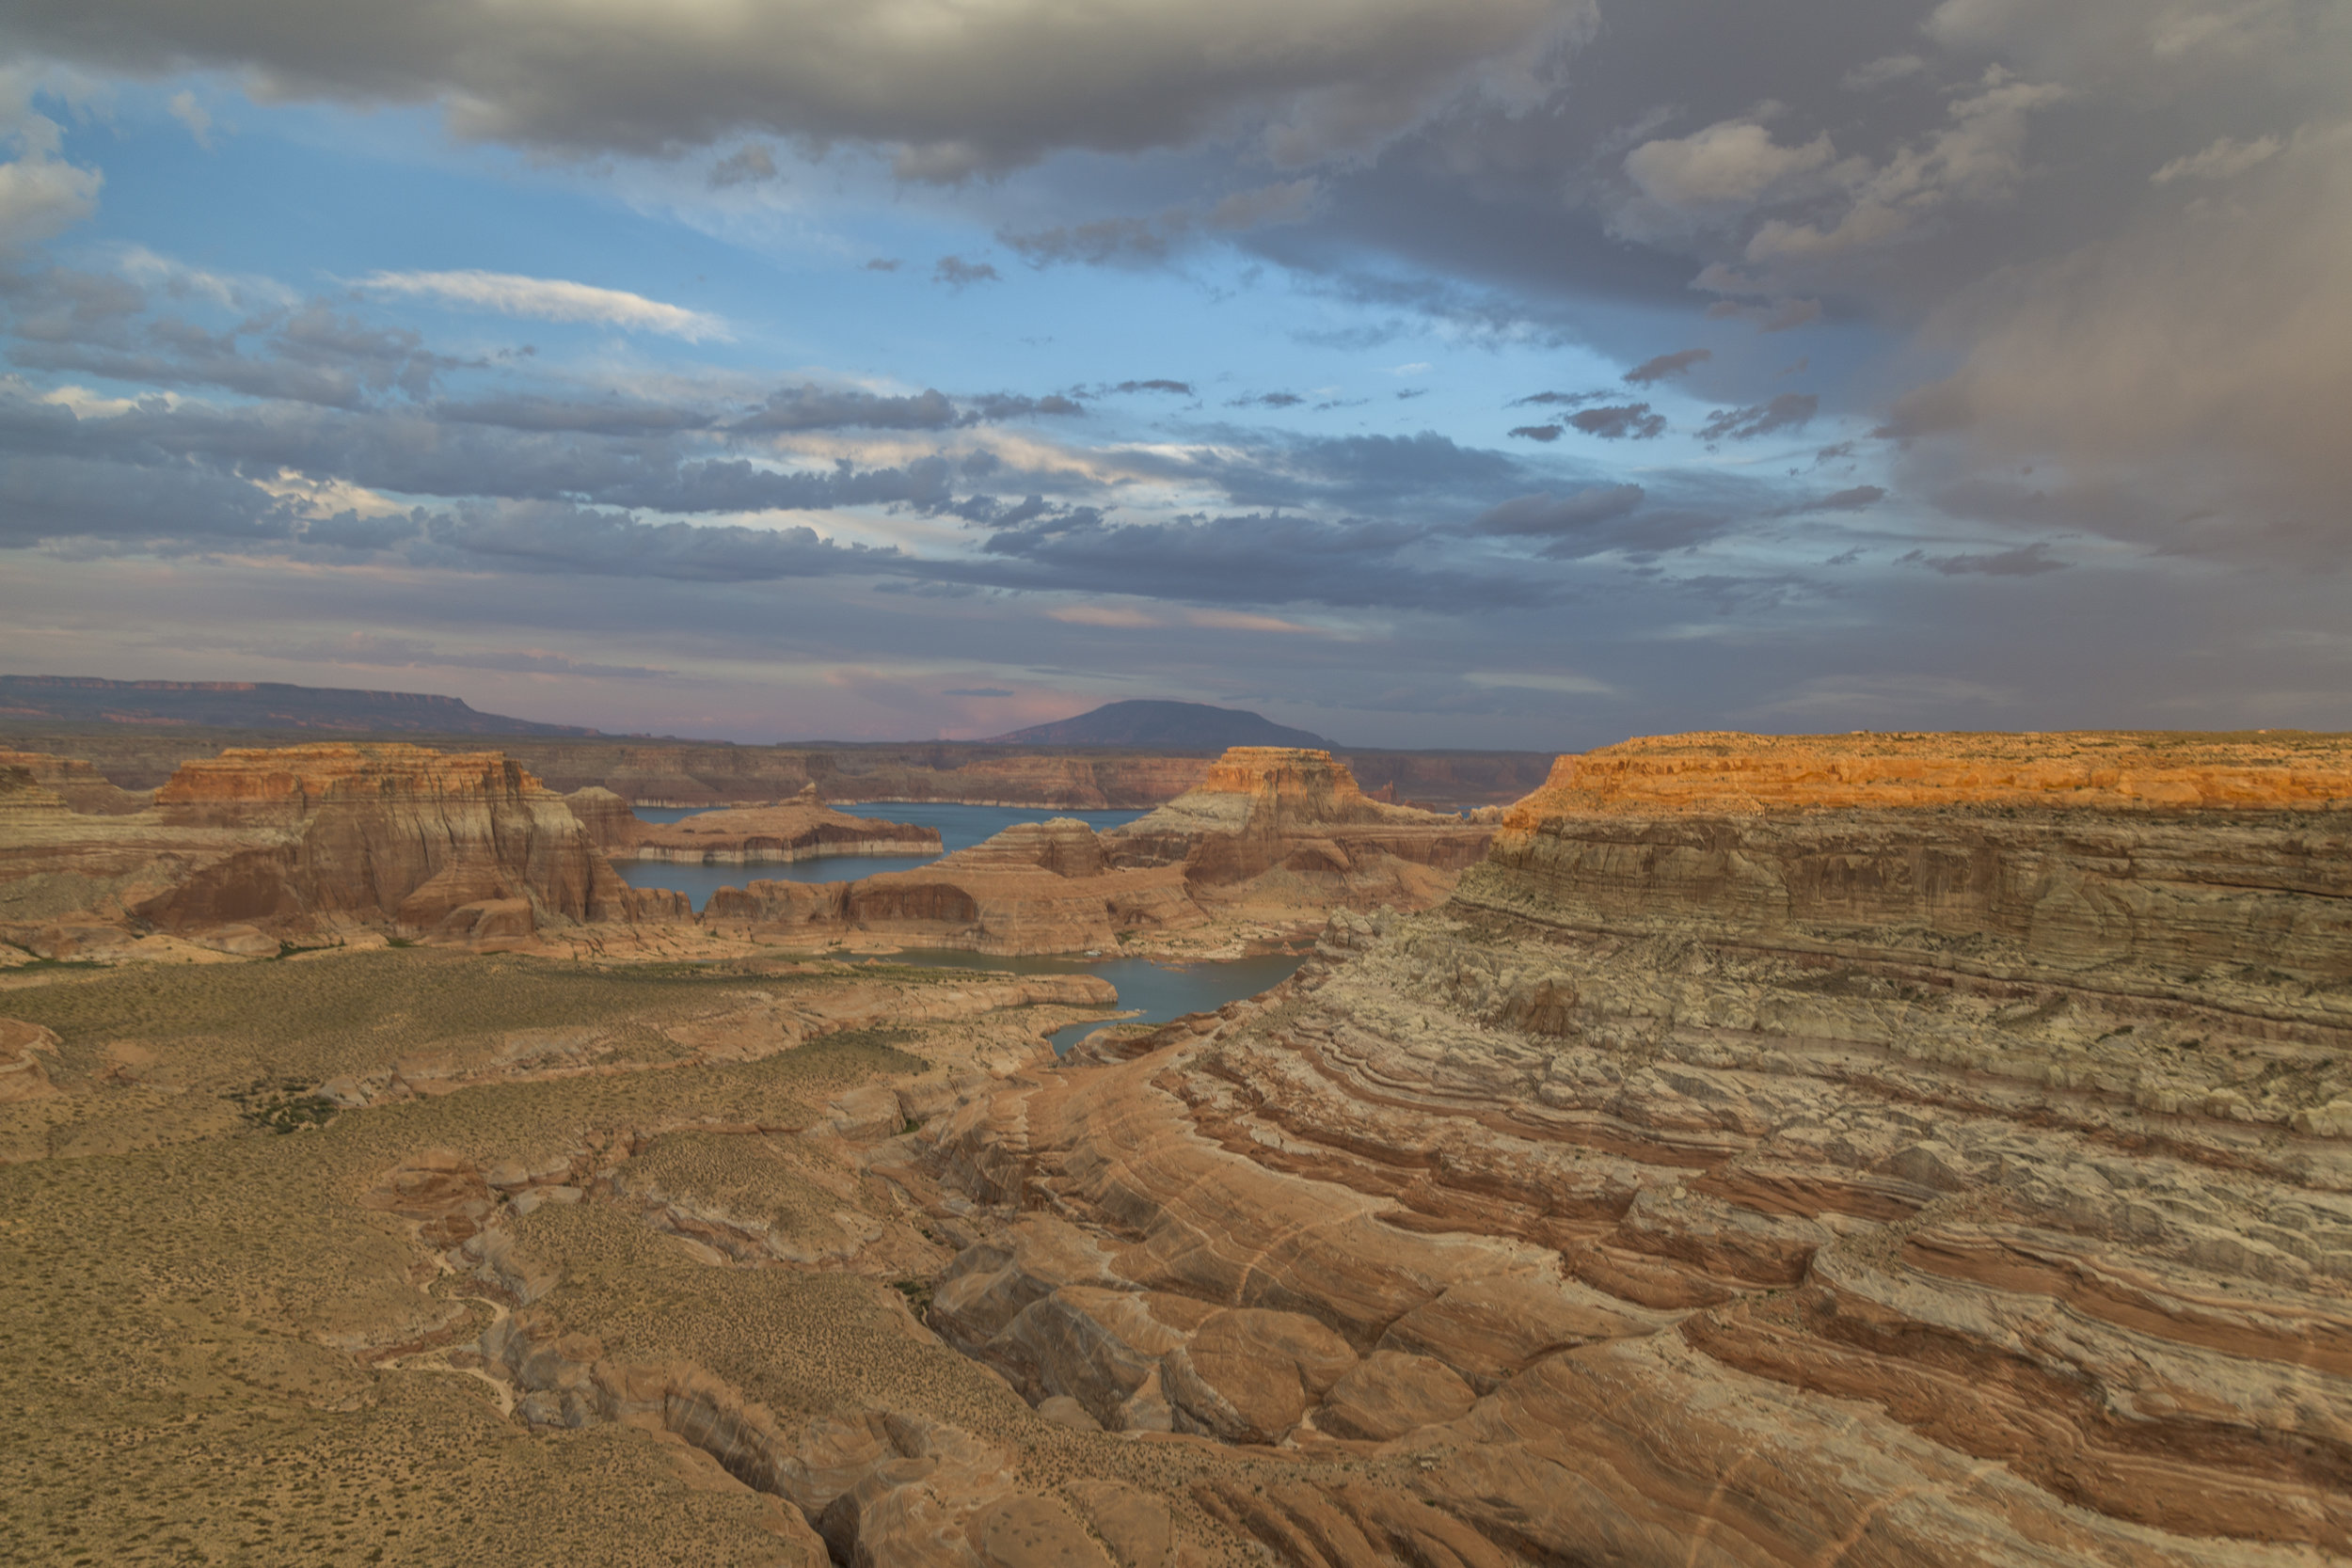 Morning - Glen Canyon